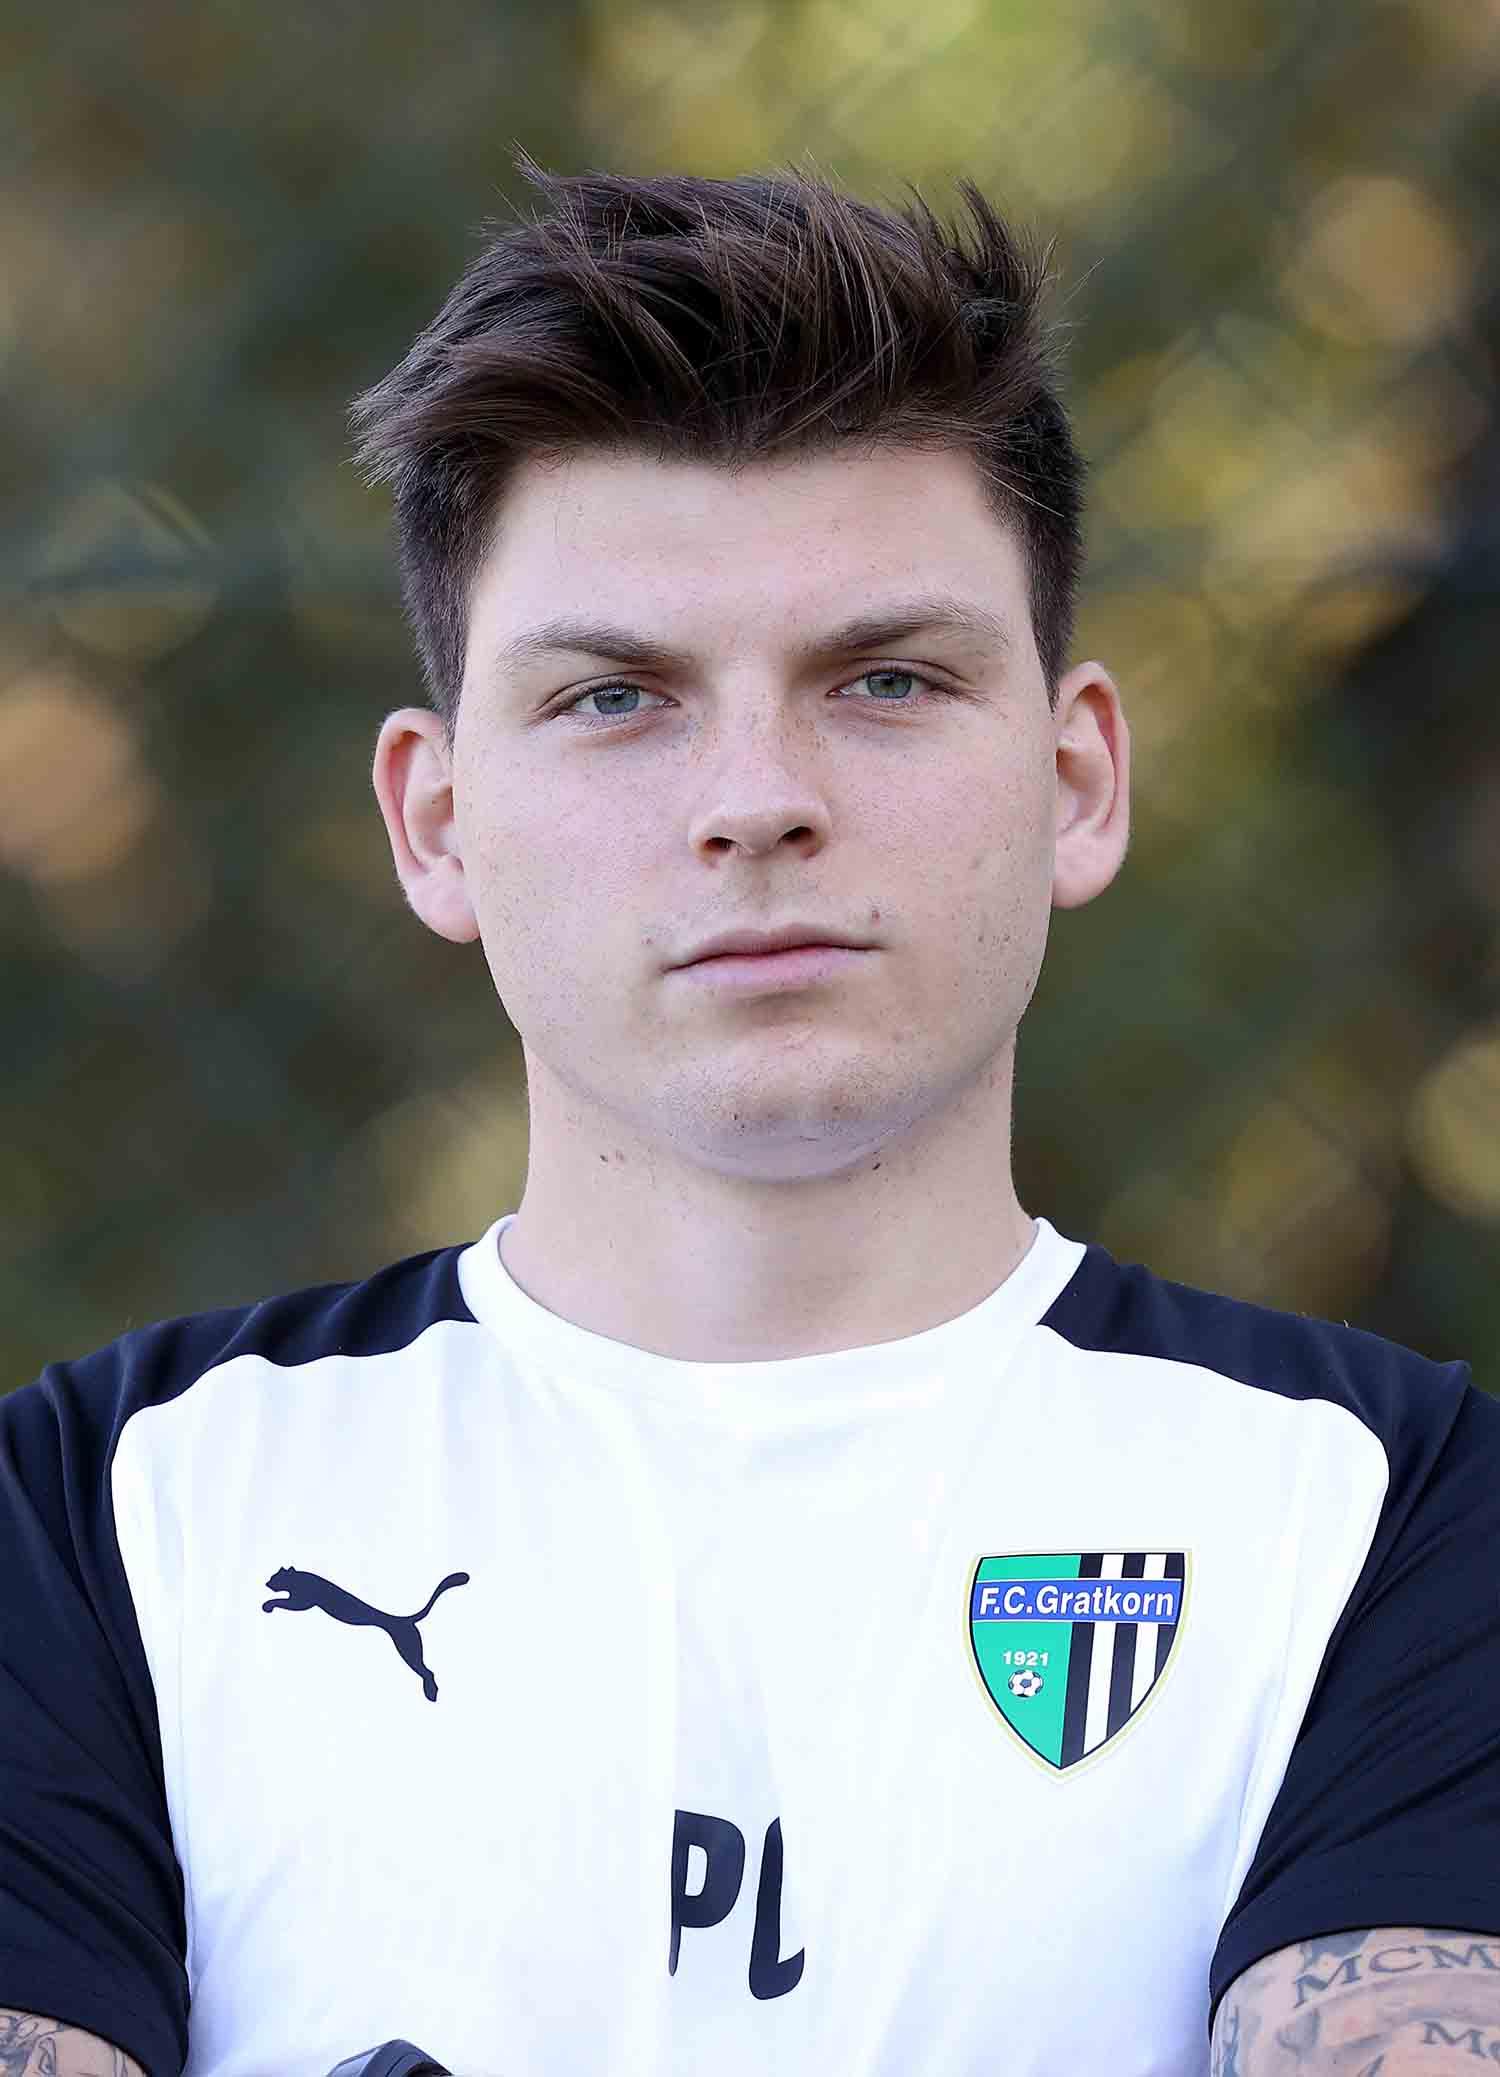 FC GRATKORN, JUGEND, NACHWUCHS FOTOTERMIN